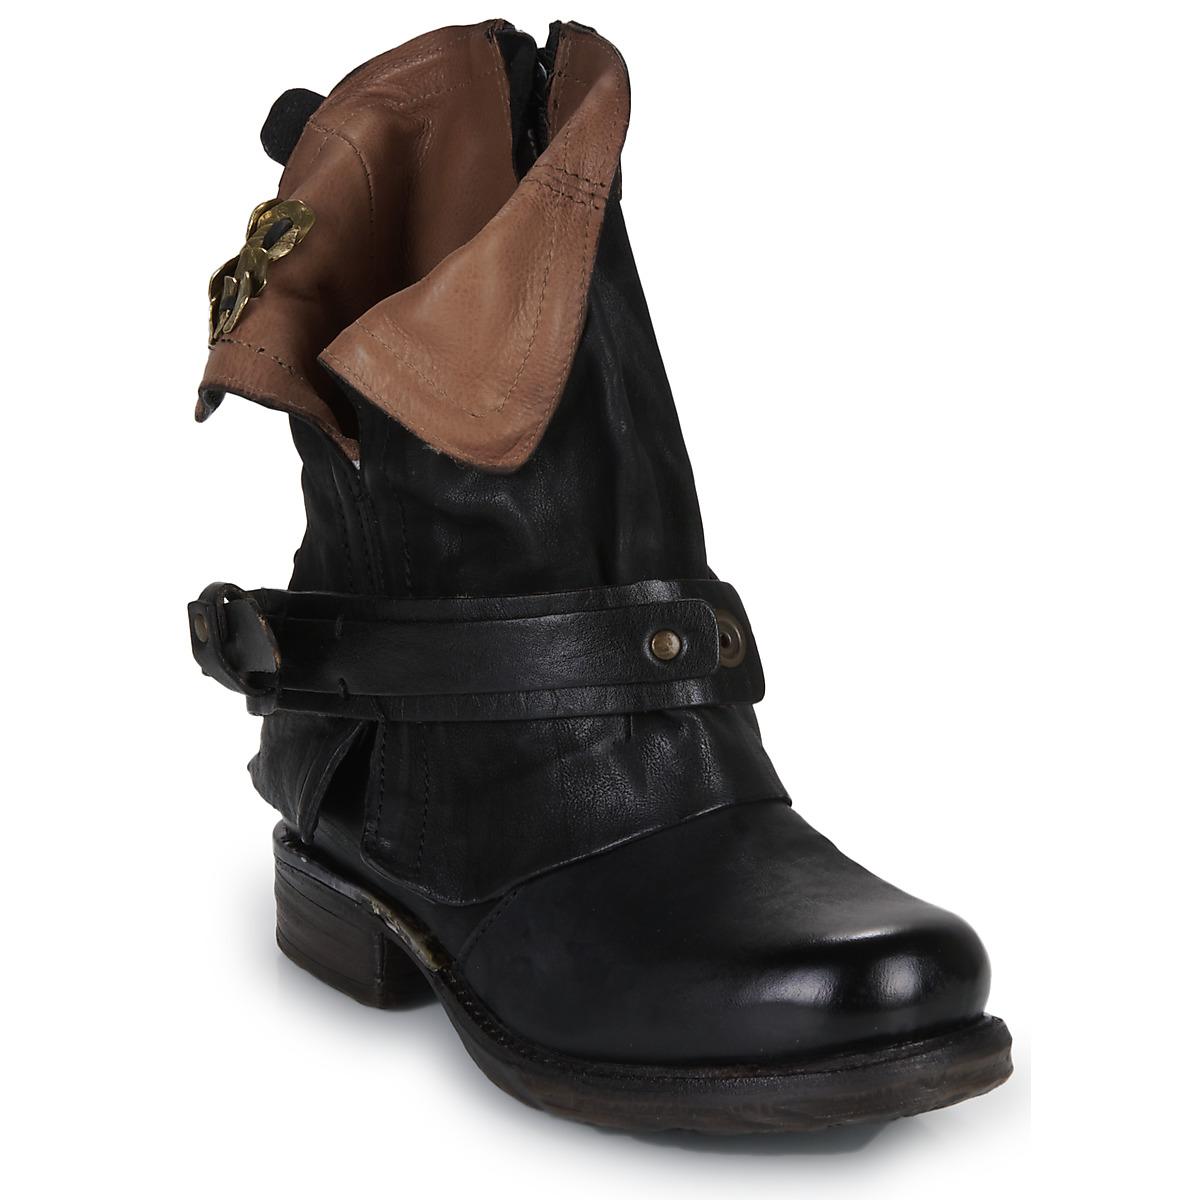 AIRSTEP   A.S.98 Schuhe, Taschen - AIRSTEP   A.S.98 - Kostenloser ... 018a4b3142